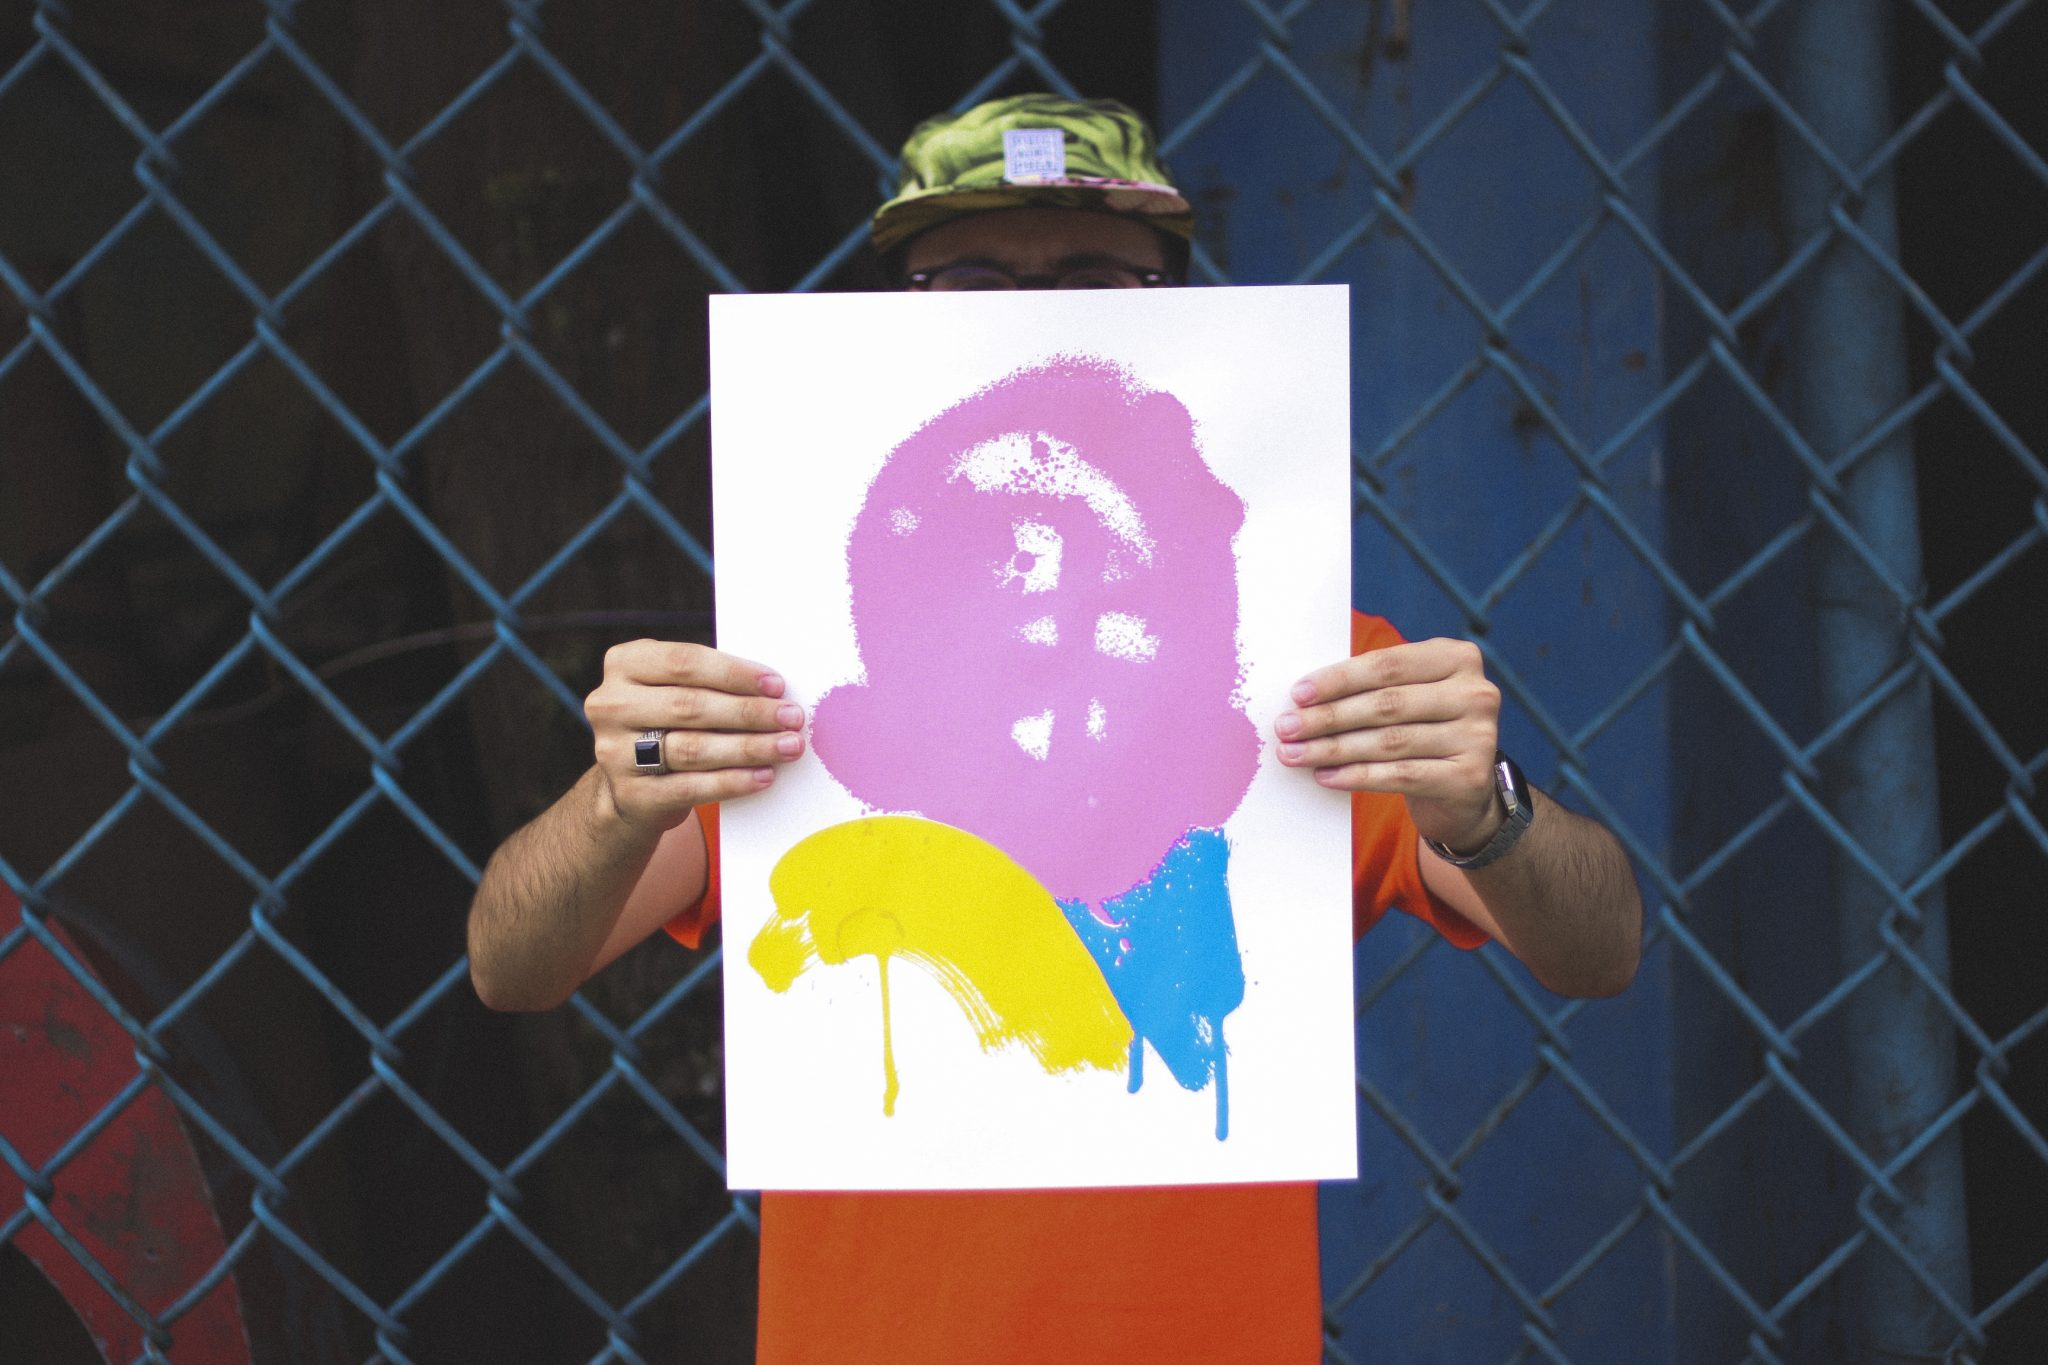 Brunno Balco Diamante, SCANDALE PROJECT, graphic, design, art, contemporary artist, emerging artist, visual art,